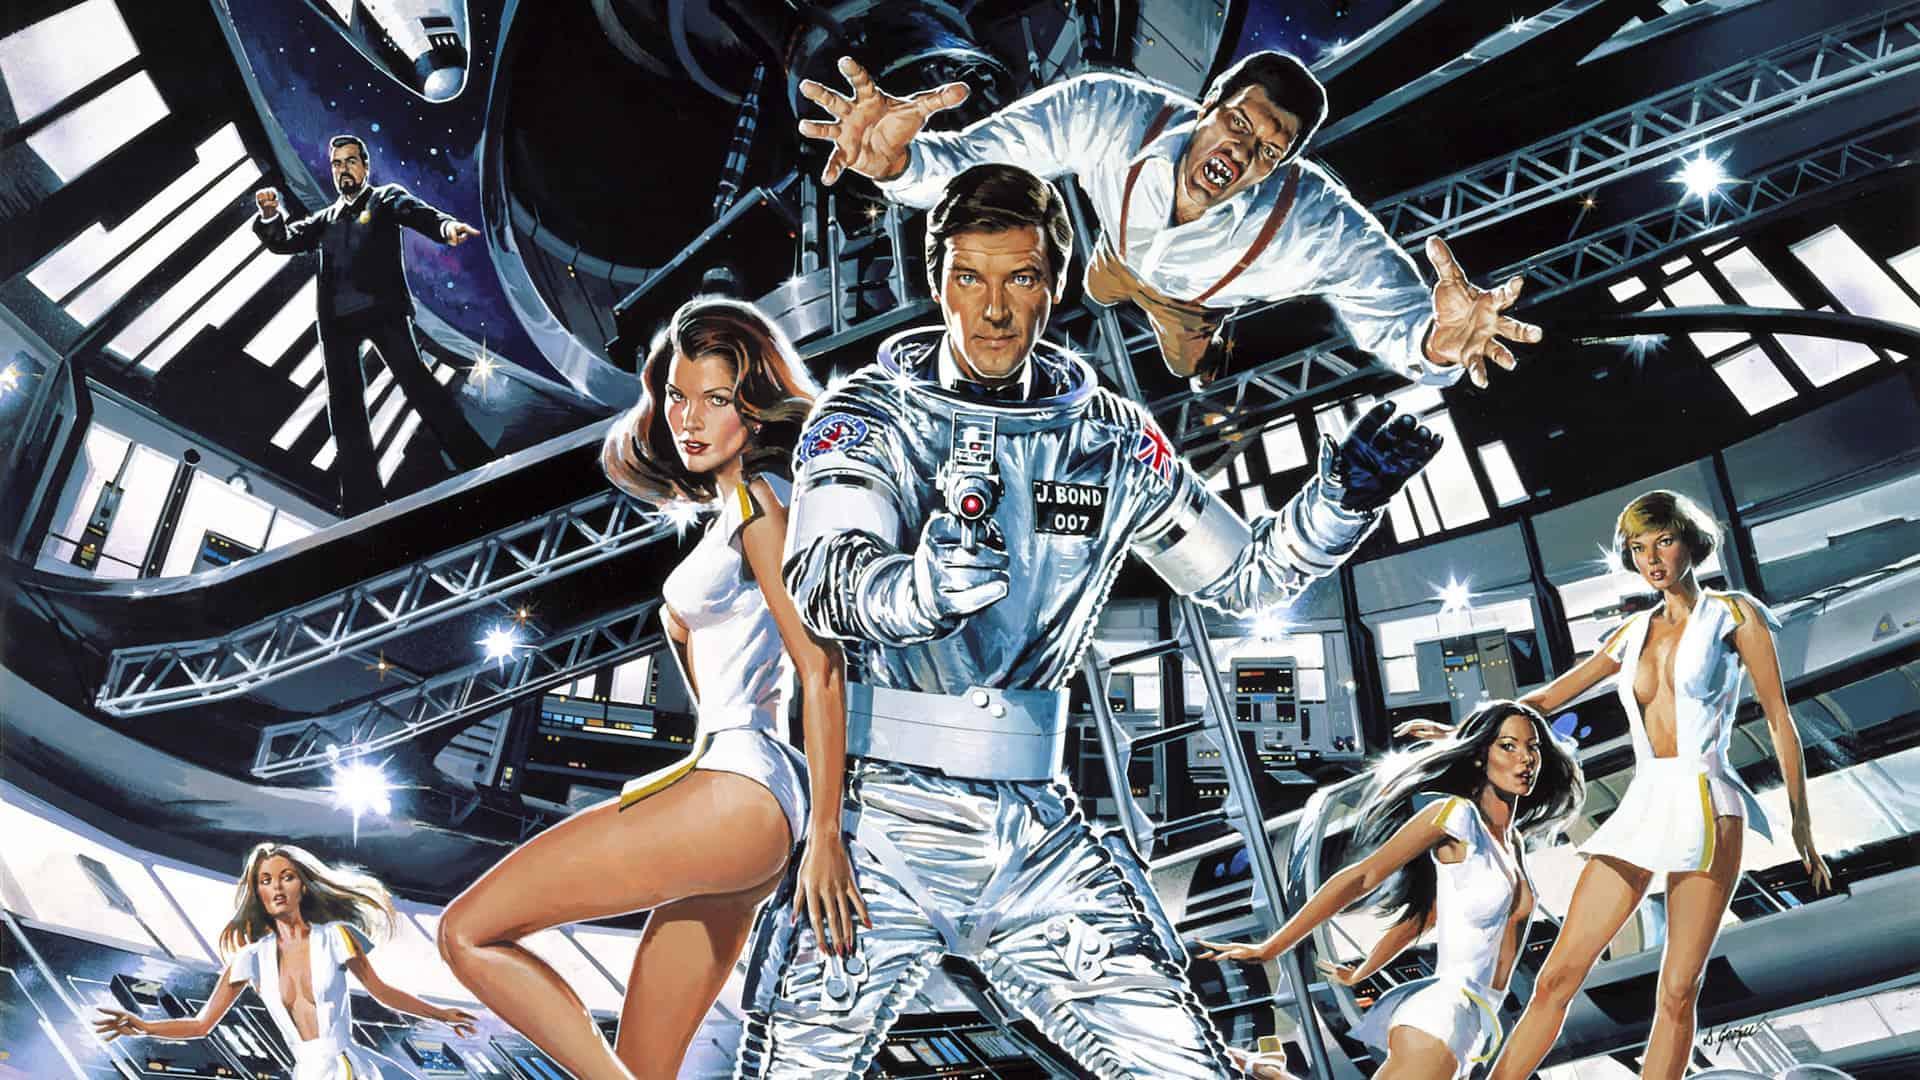 'Moonraker' Delivers Bond to a Post 'Star Wars' Generation